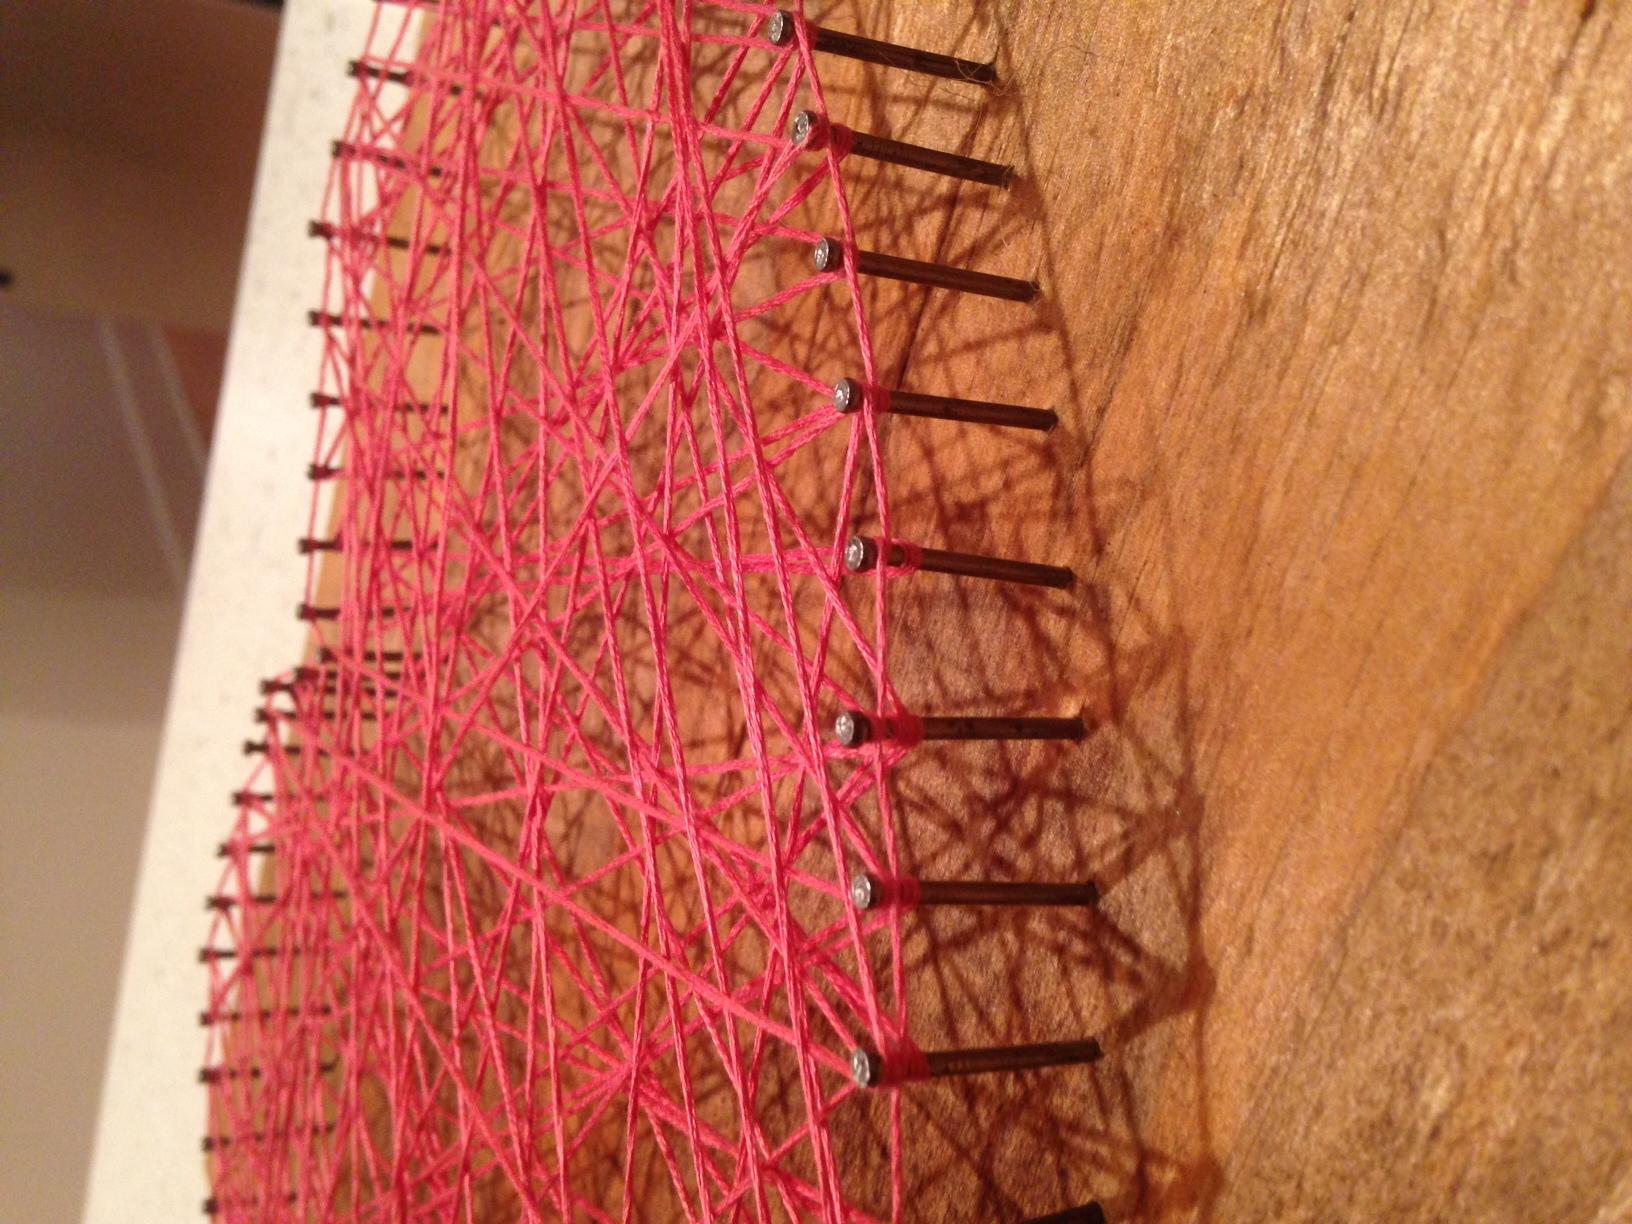 Image 3 of DIY String Heart